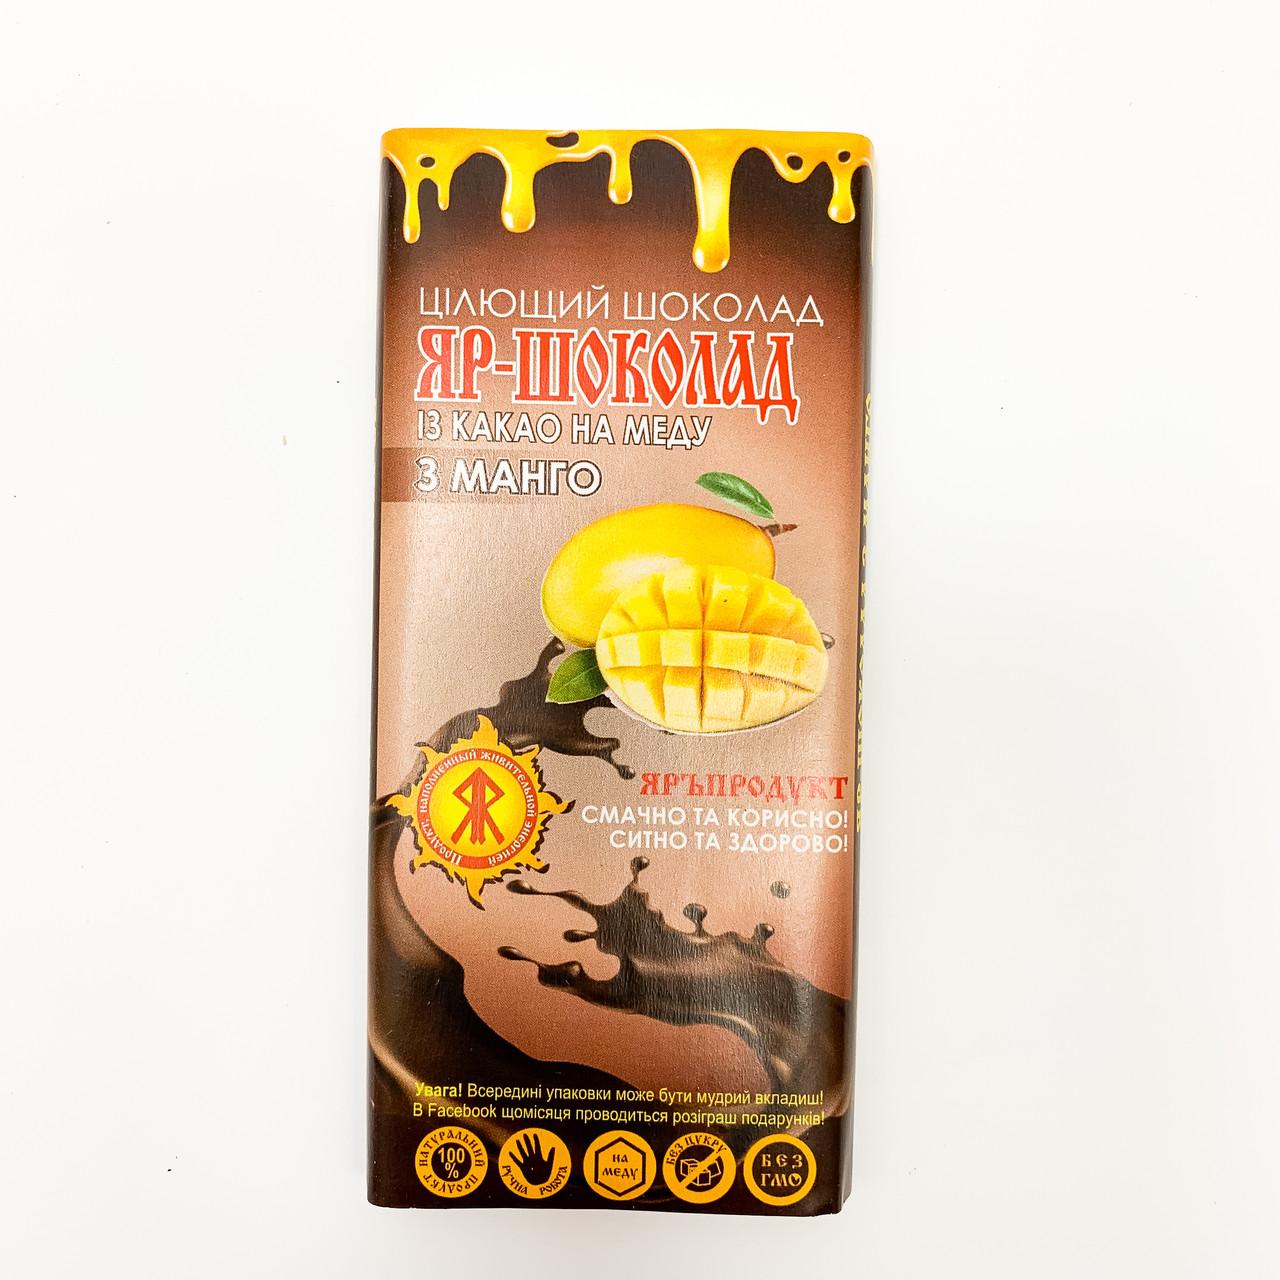 Яръ-шоколад с манго, 100 г